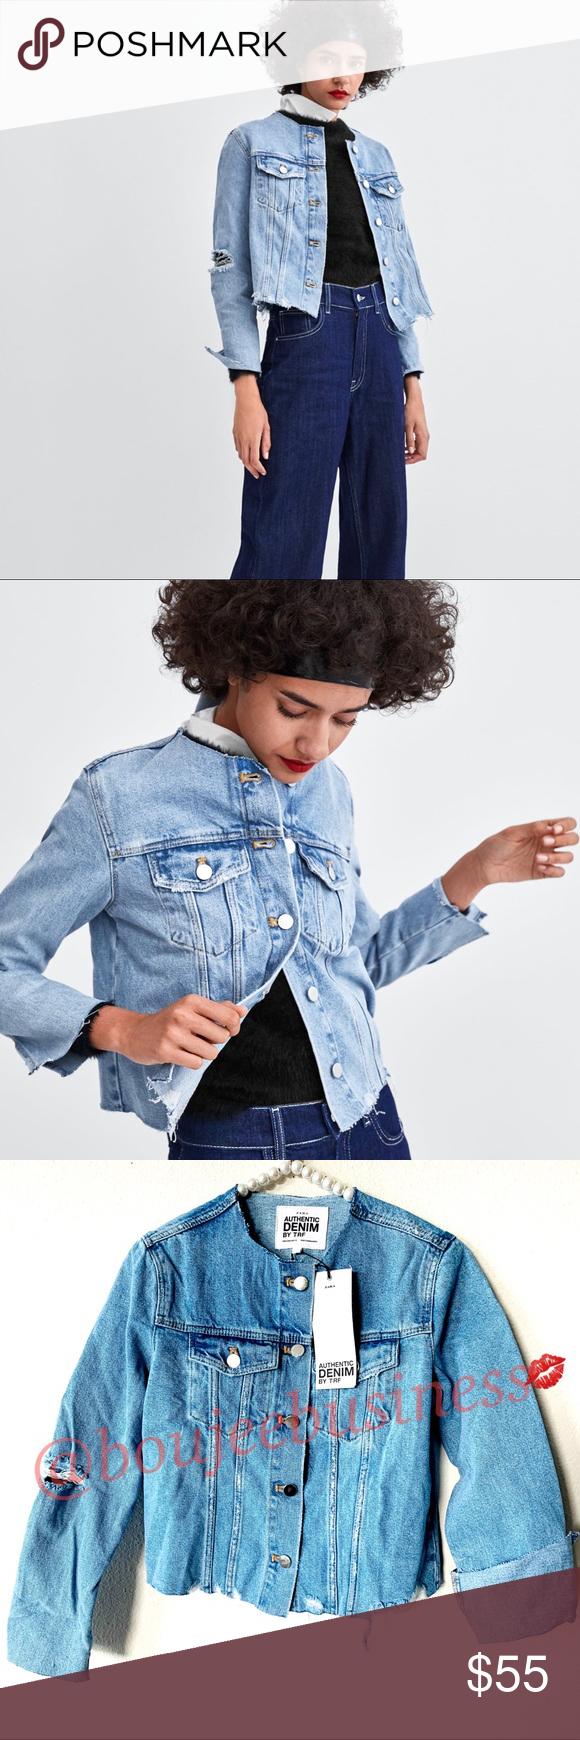 Zara Collar Less Denim Jacket Collarless Denim Jacket Denim Jacket Zara Denim Jacket [ 1740 x 580 Pixel ]